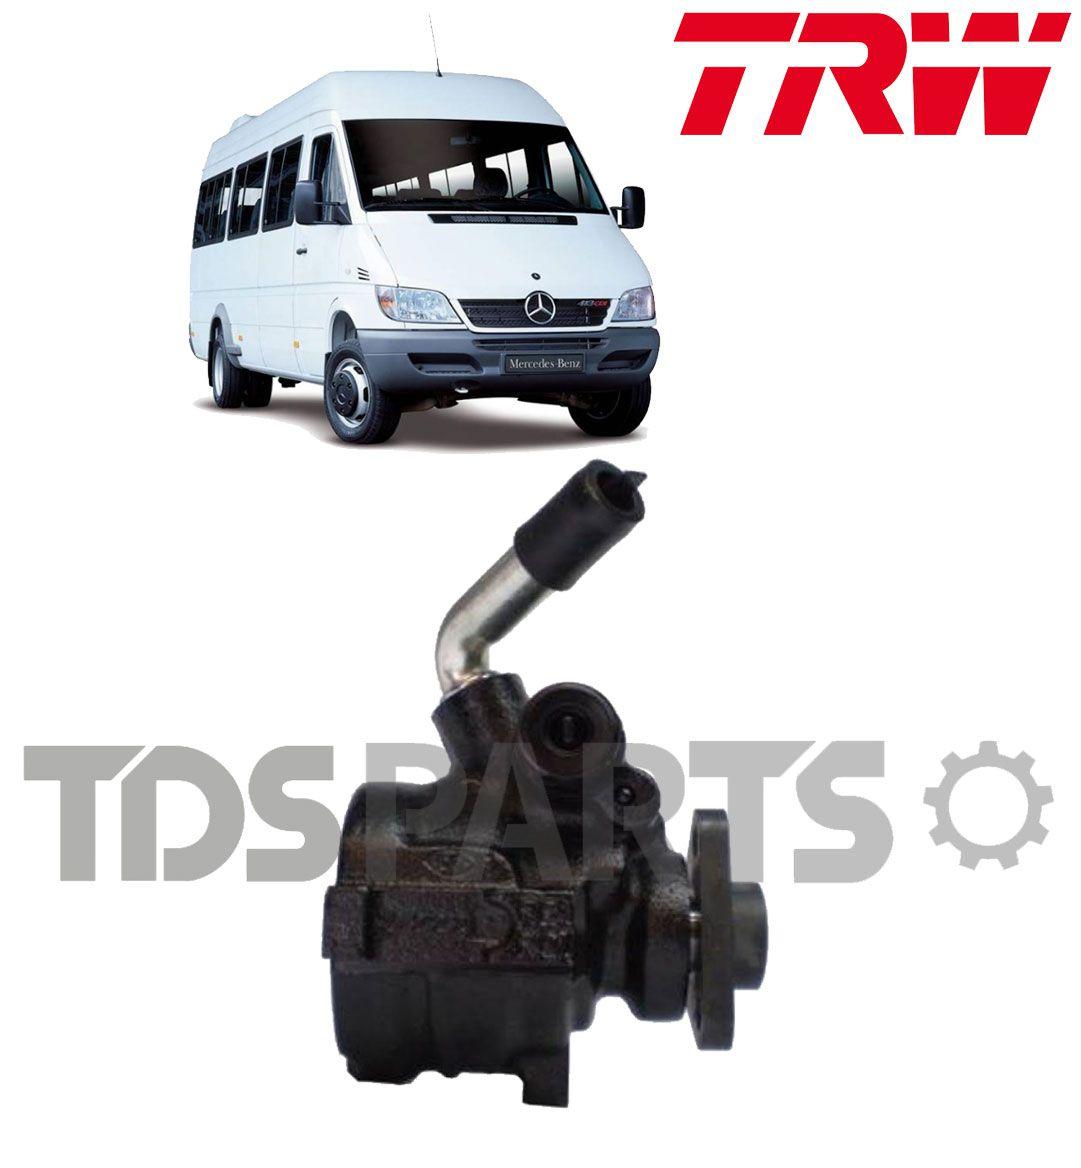 Bomba De Direção Hidráulica TRW Sprinter 310 | 315 | 2.5 HS Maxion